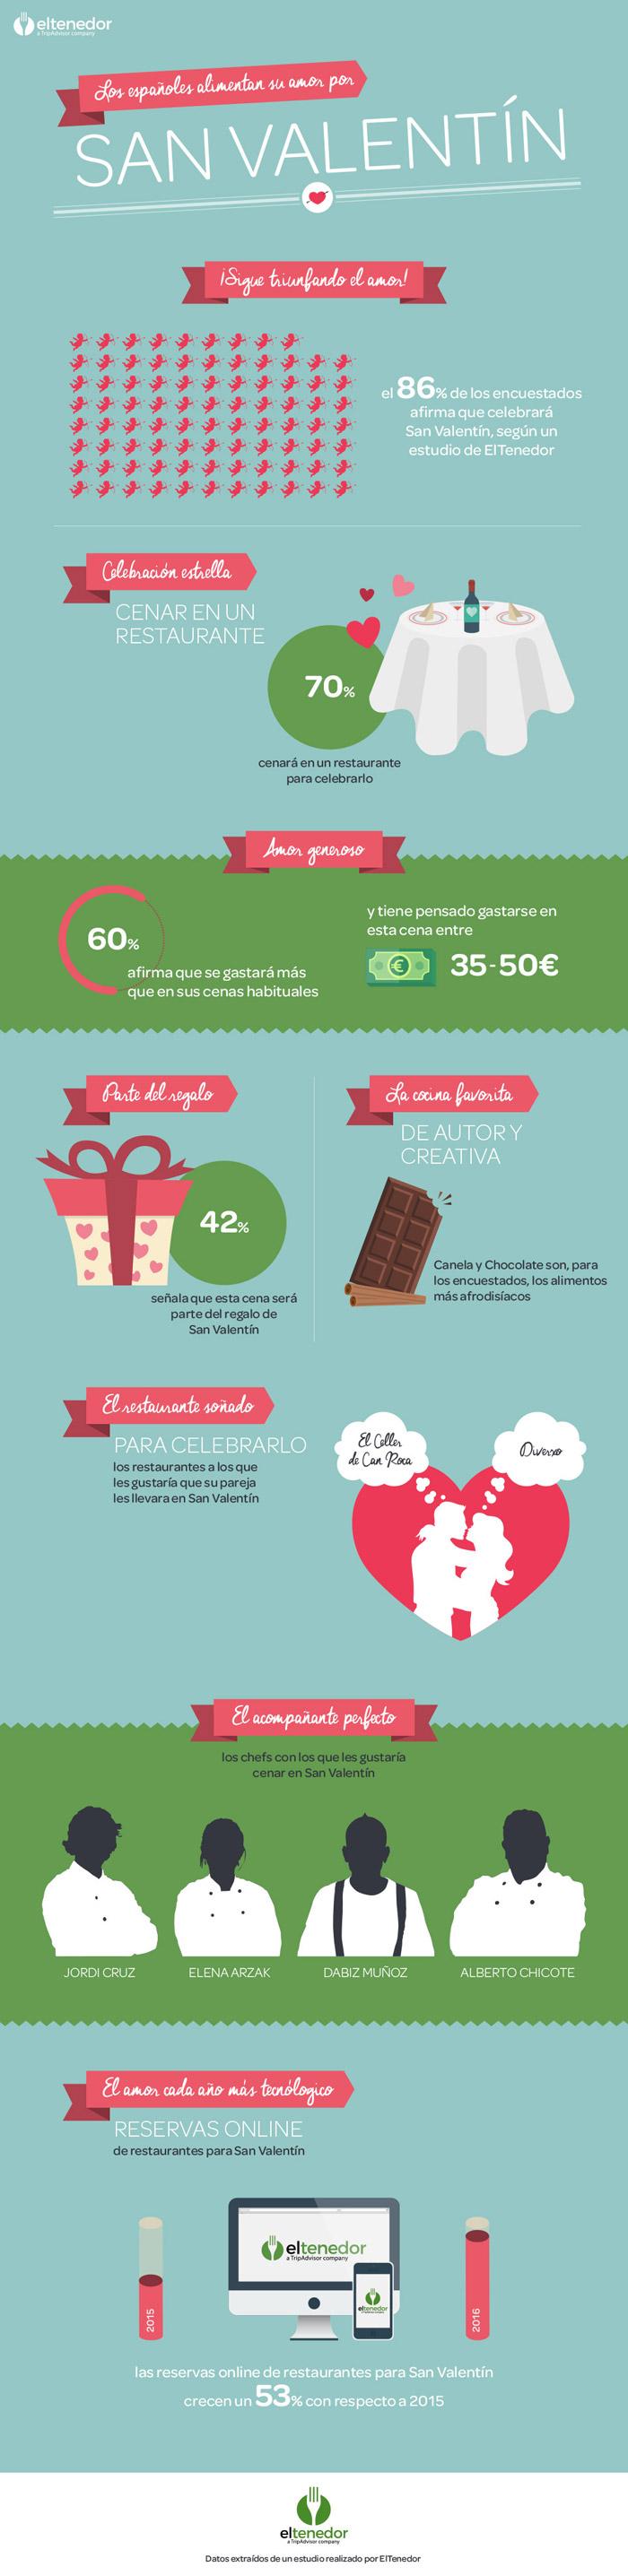 ElTenedor-SanValentin-Infografia_md